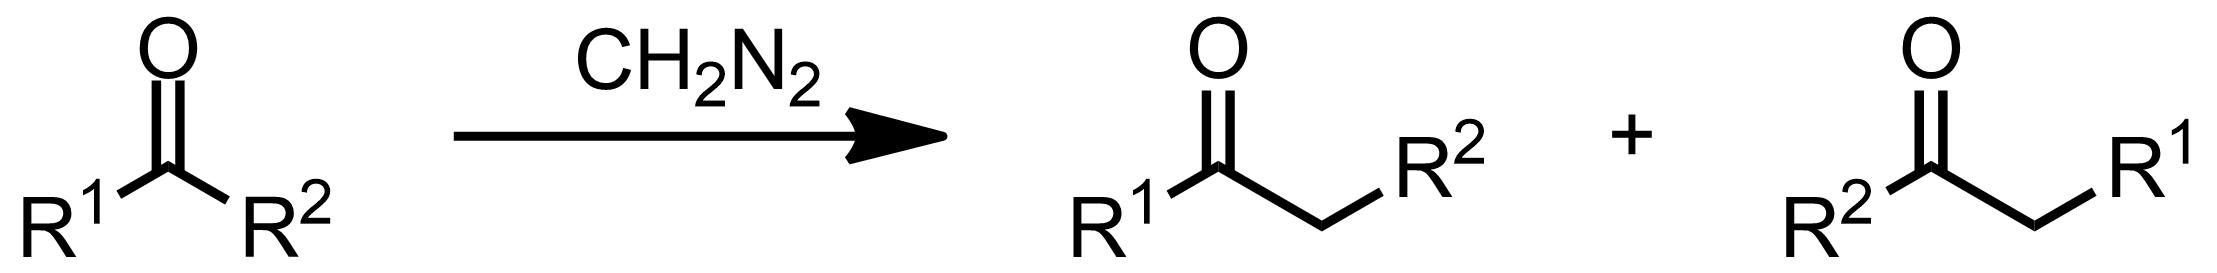 Schematic representation of the Büchner-Curtius-Schlotterbeck Reaction.